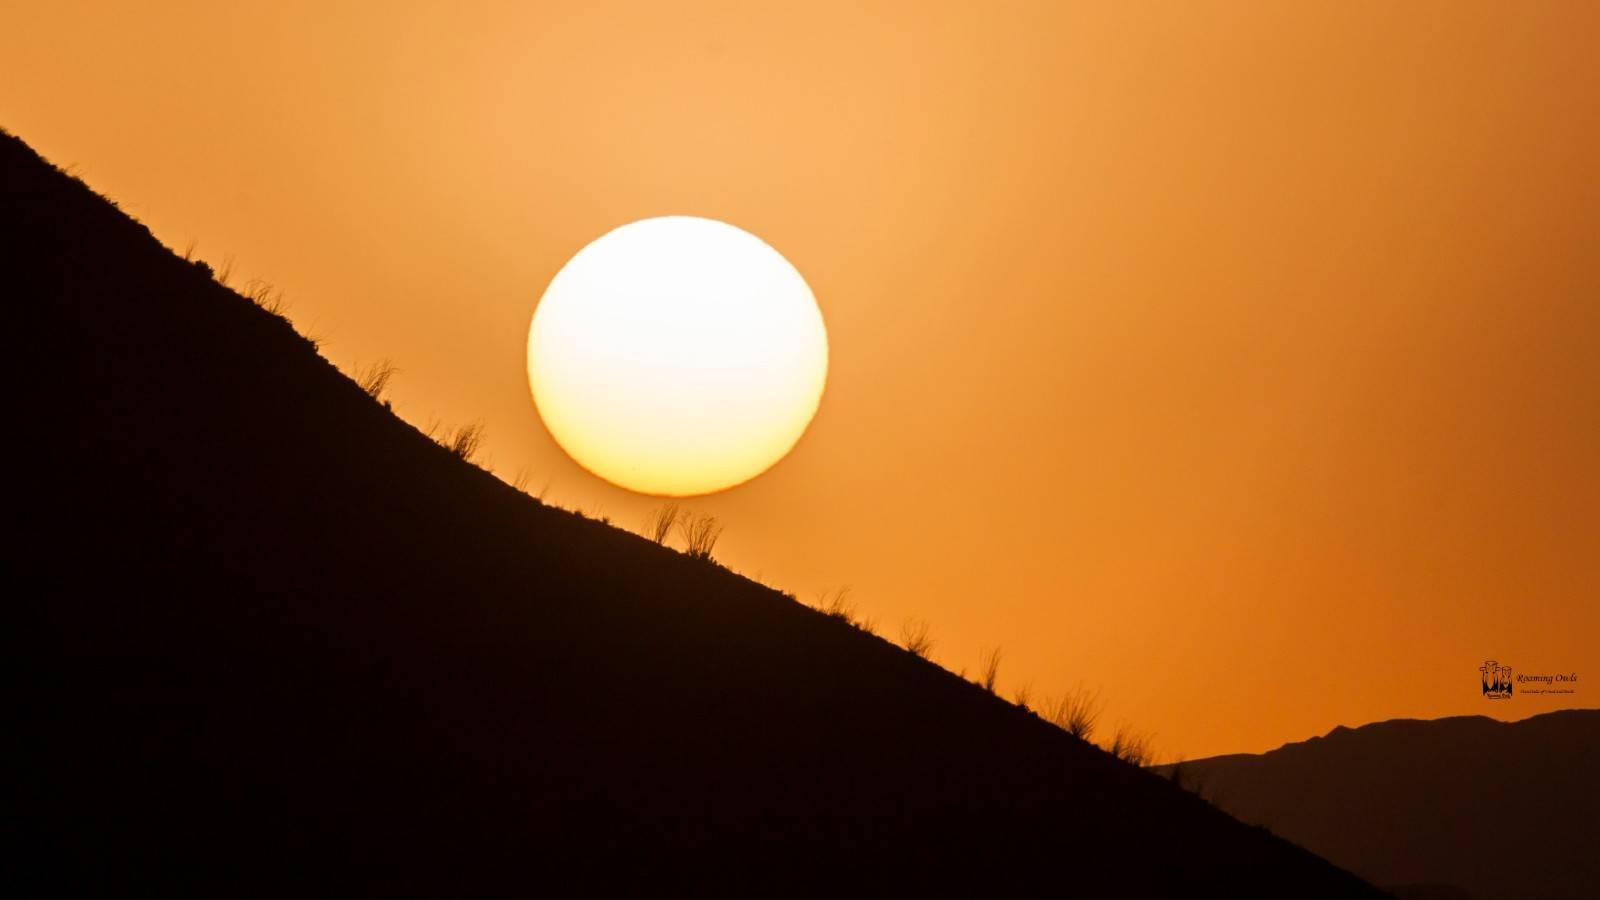 bigbend national park,sunset, emory peak,texas